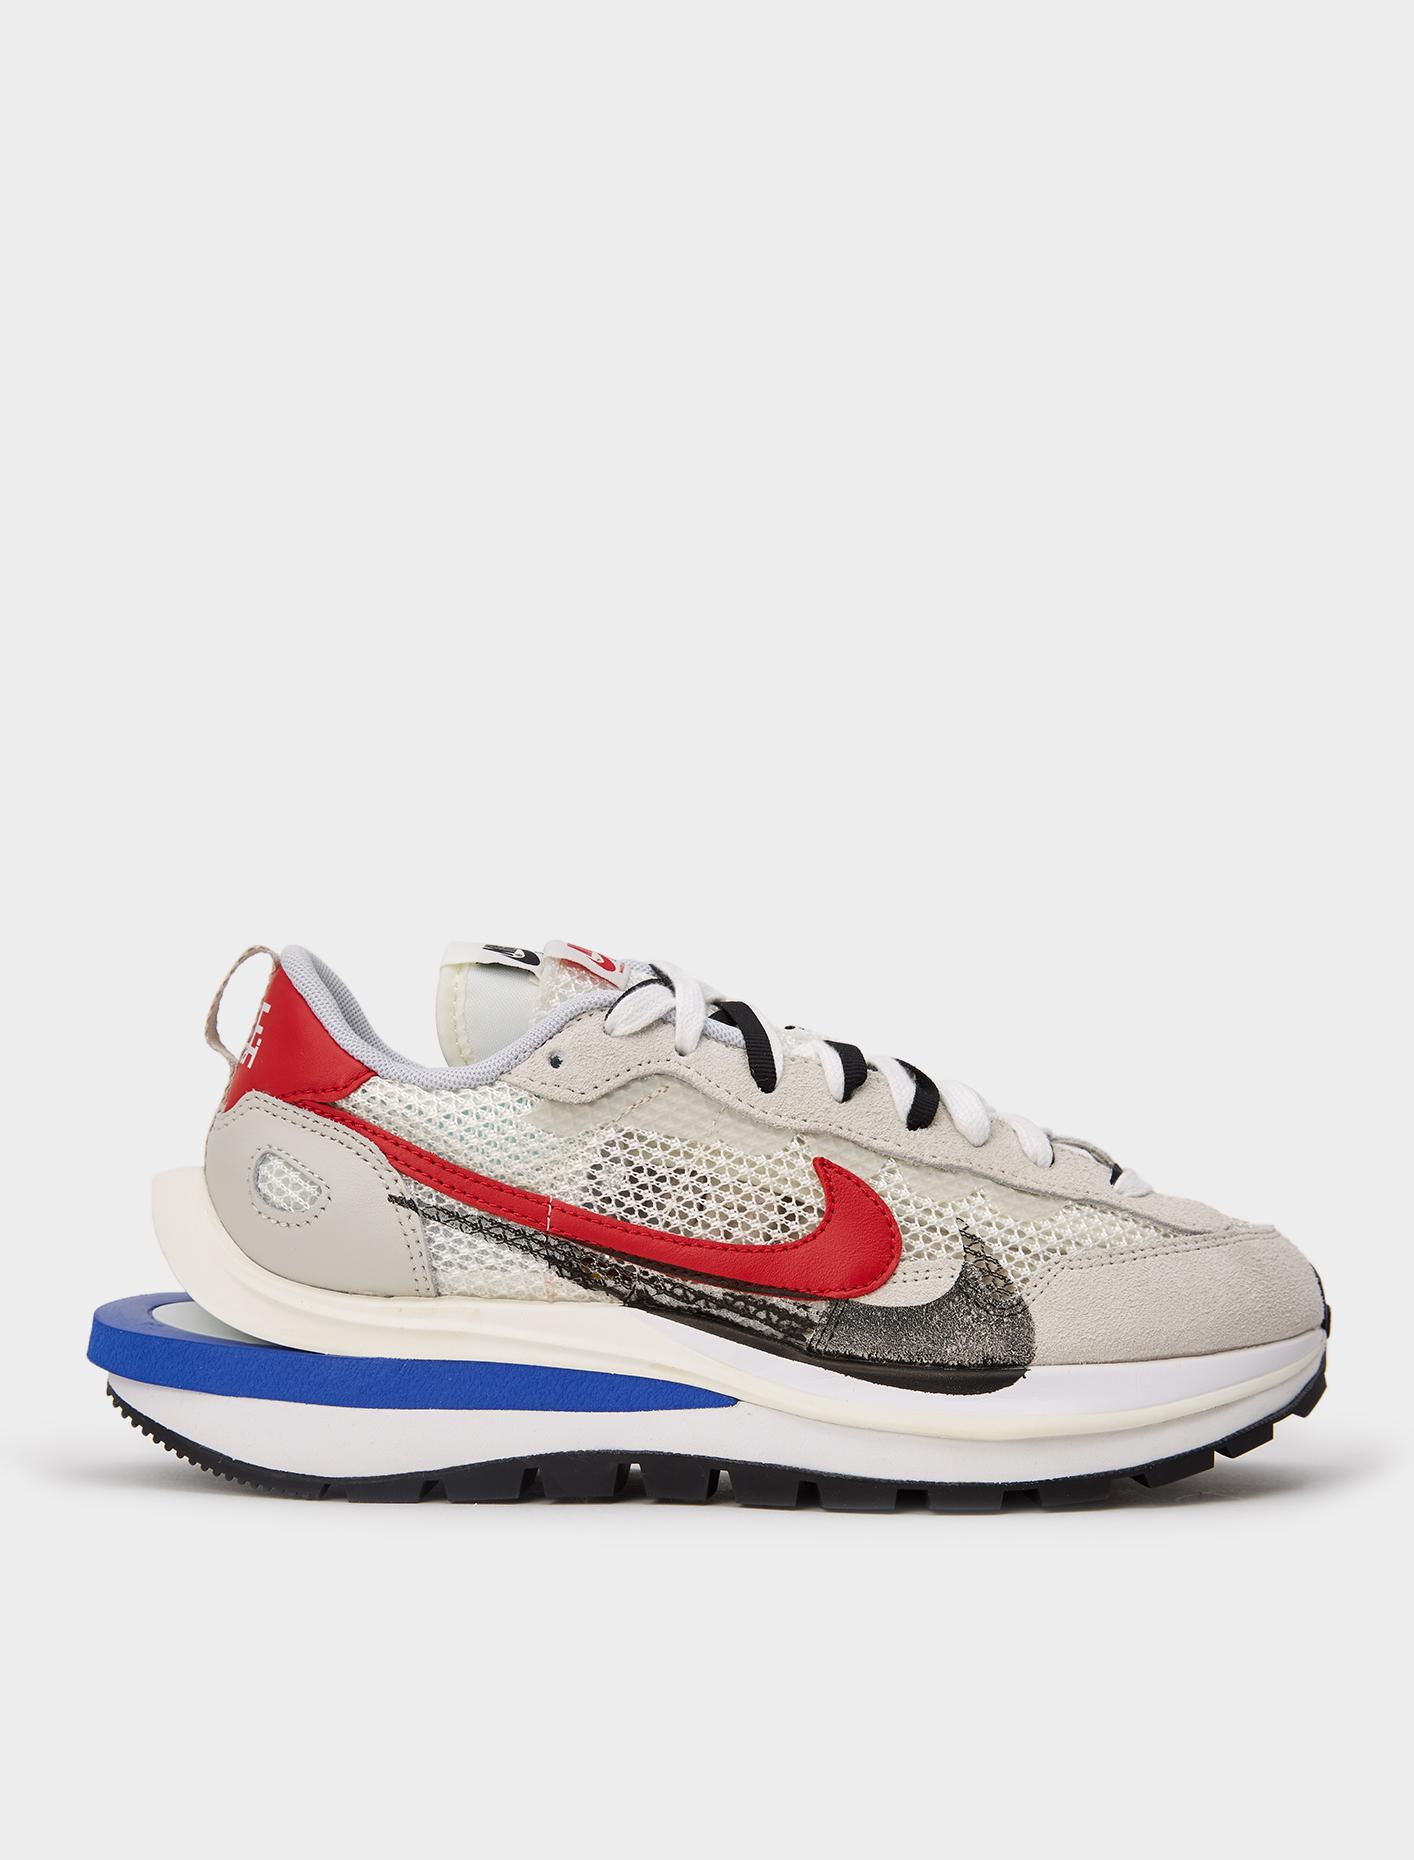 Nike x Sacai Vaporwaffle Sneaker in